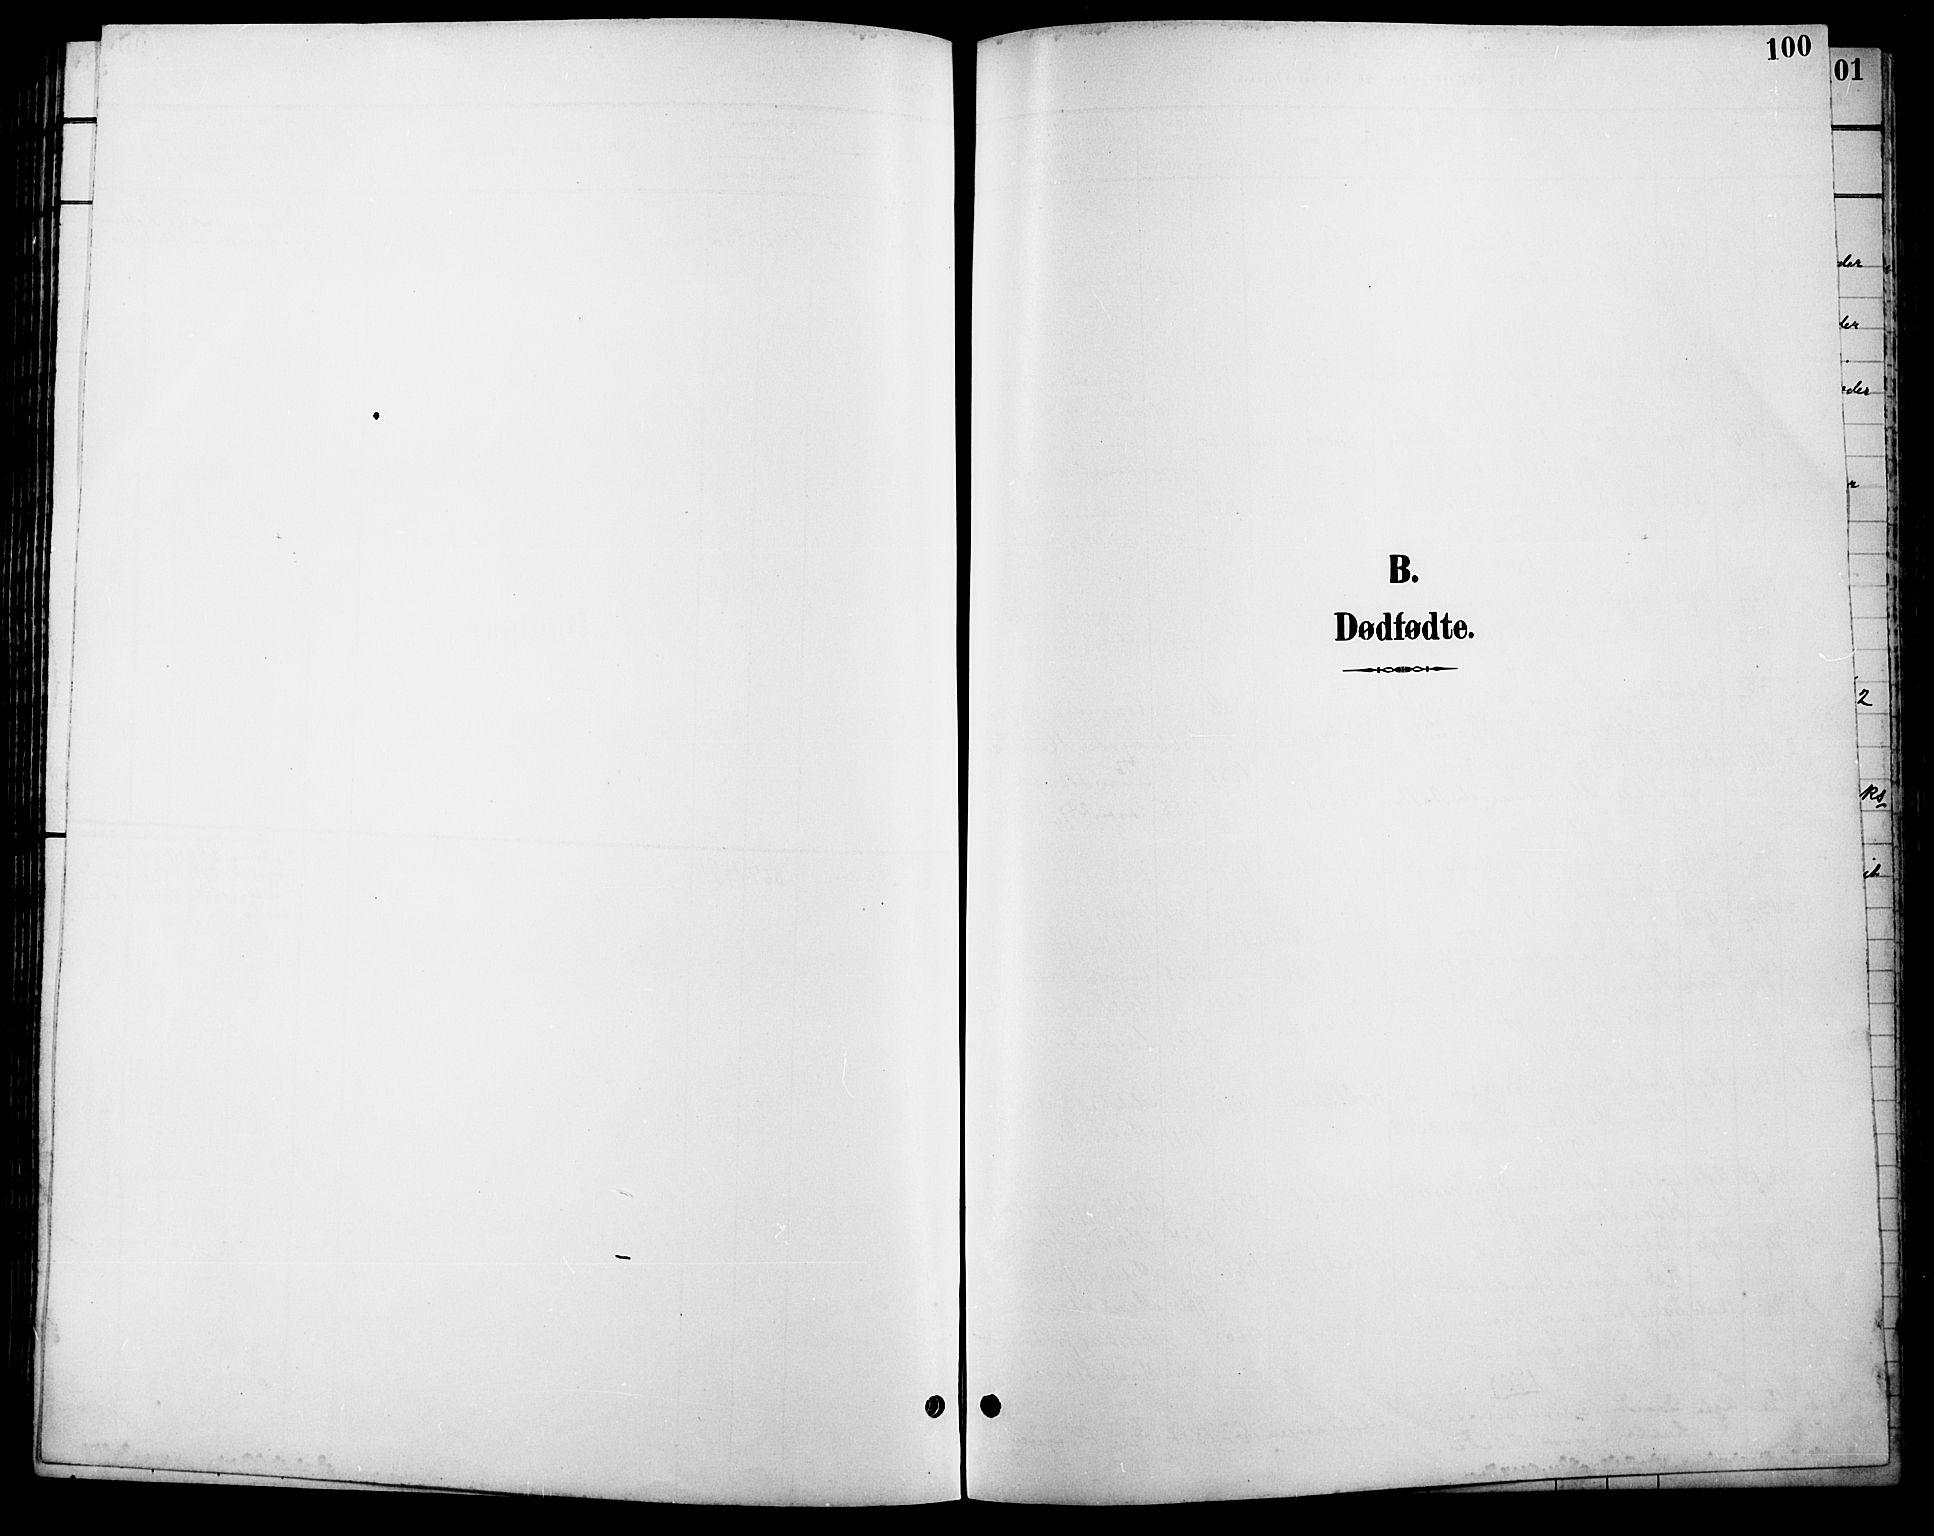 SAH, Lesja prestekontor, Klokkerbok nr. 7, 1895-1919, s. 100